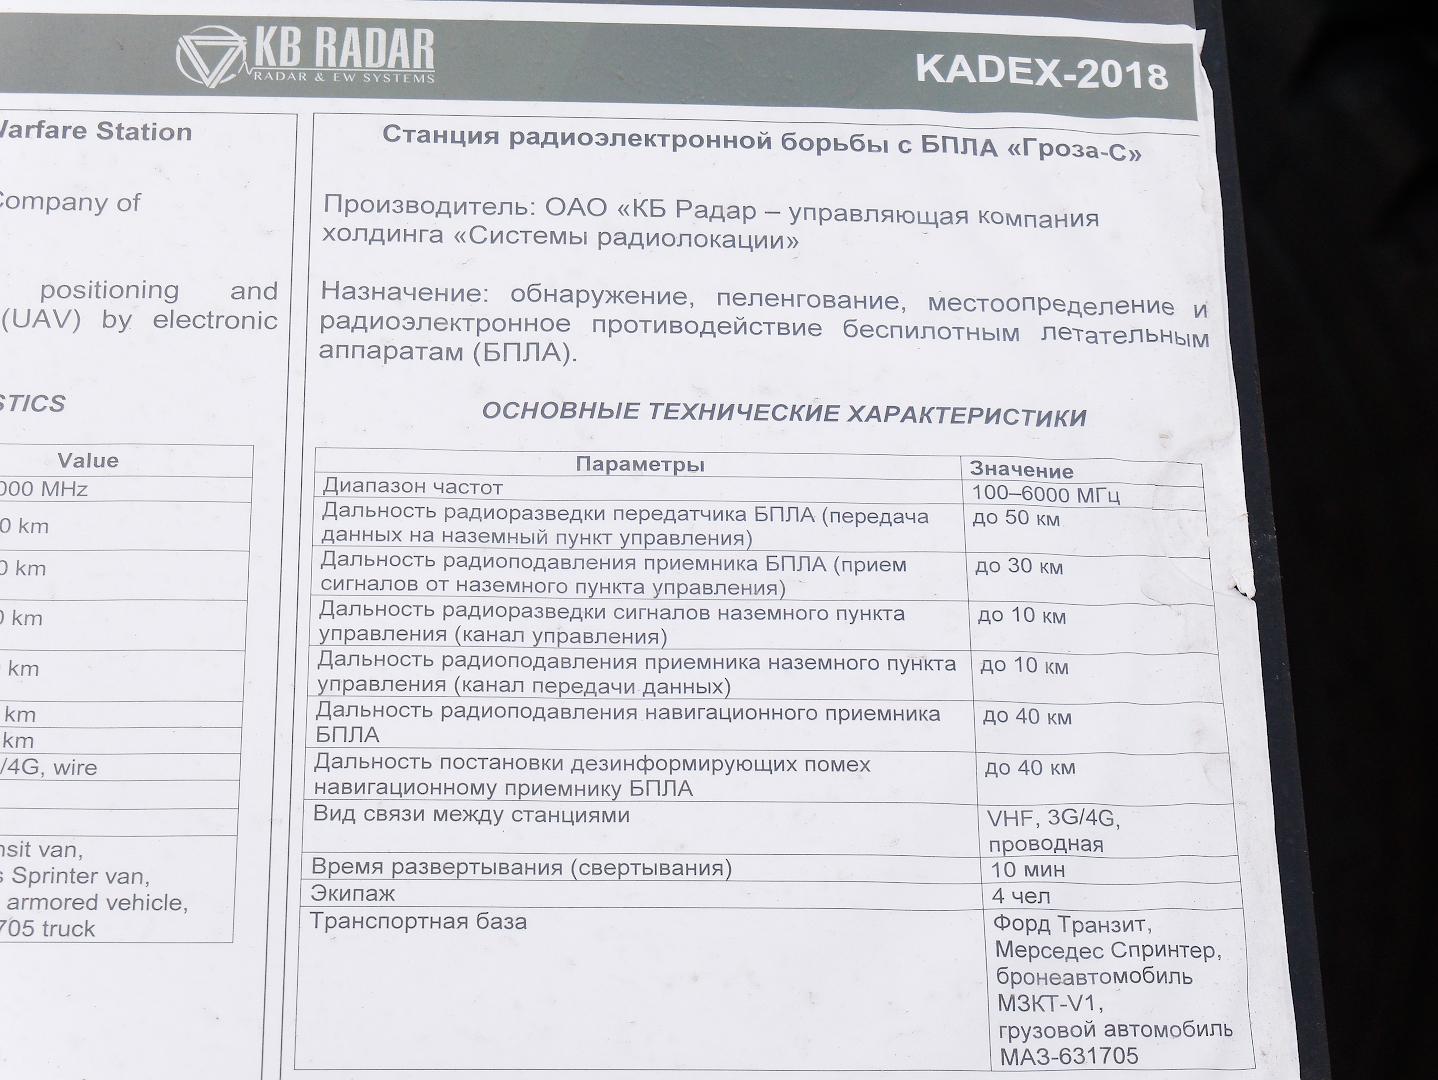 http://s3.uplds.ru/ADKia.jpg